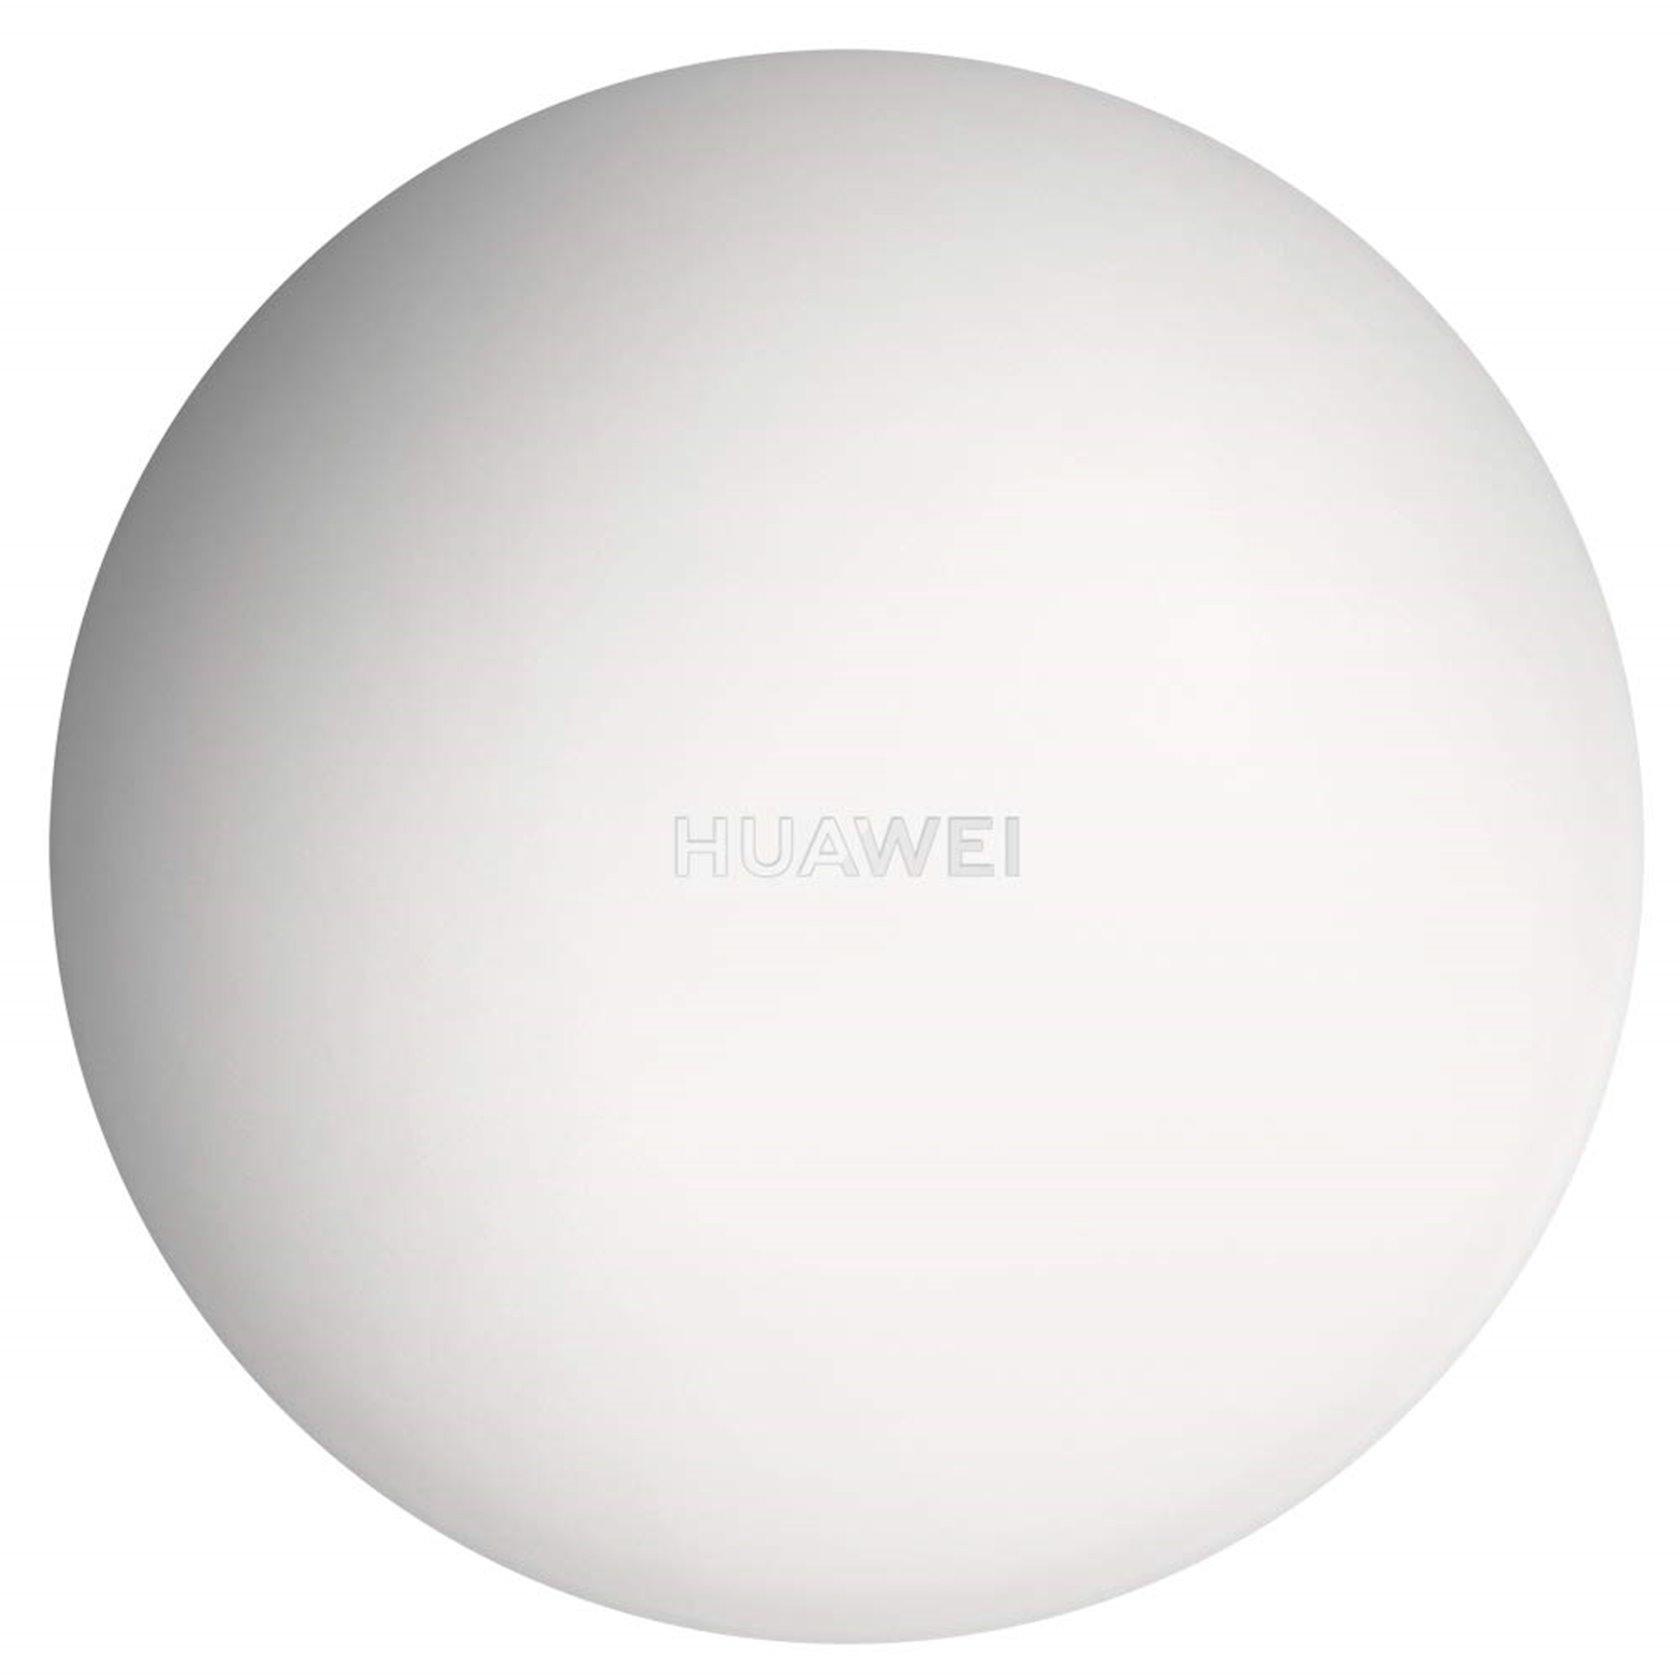 Simsiz enerji toplama cihazı Huawei CP60 Wireless Quick Charger White